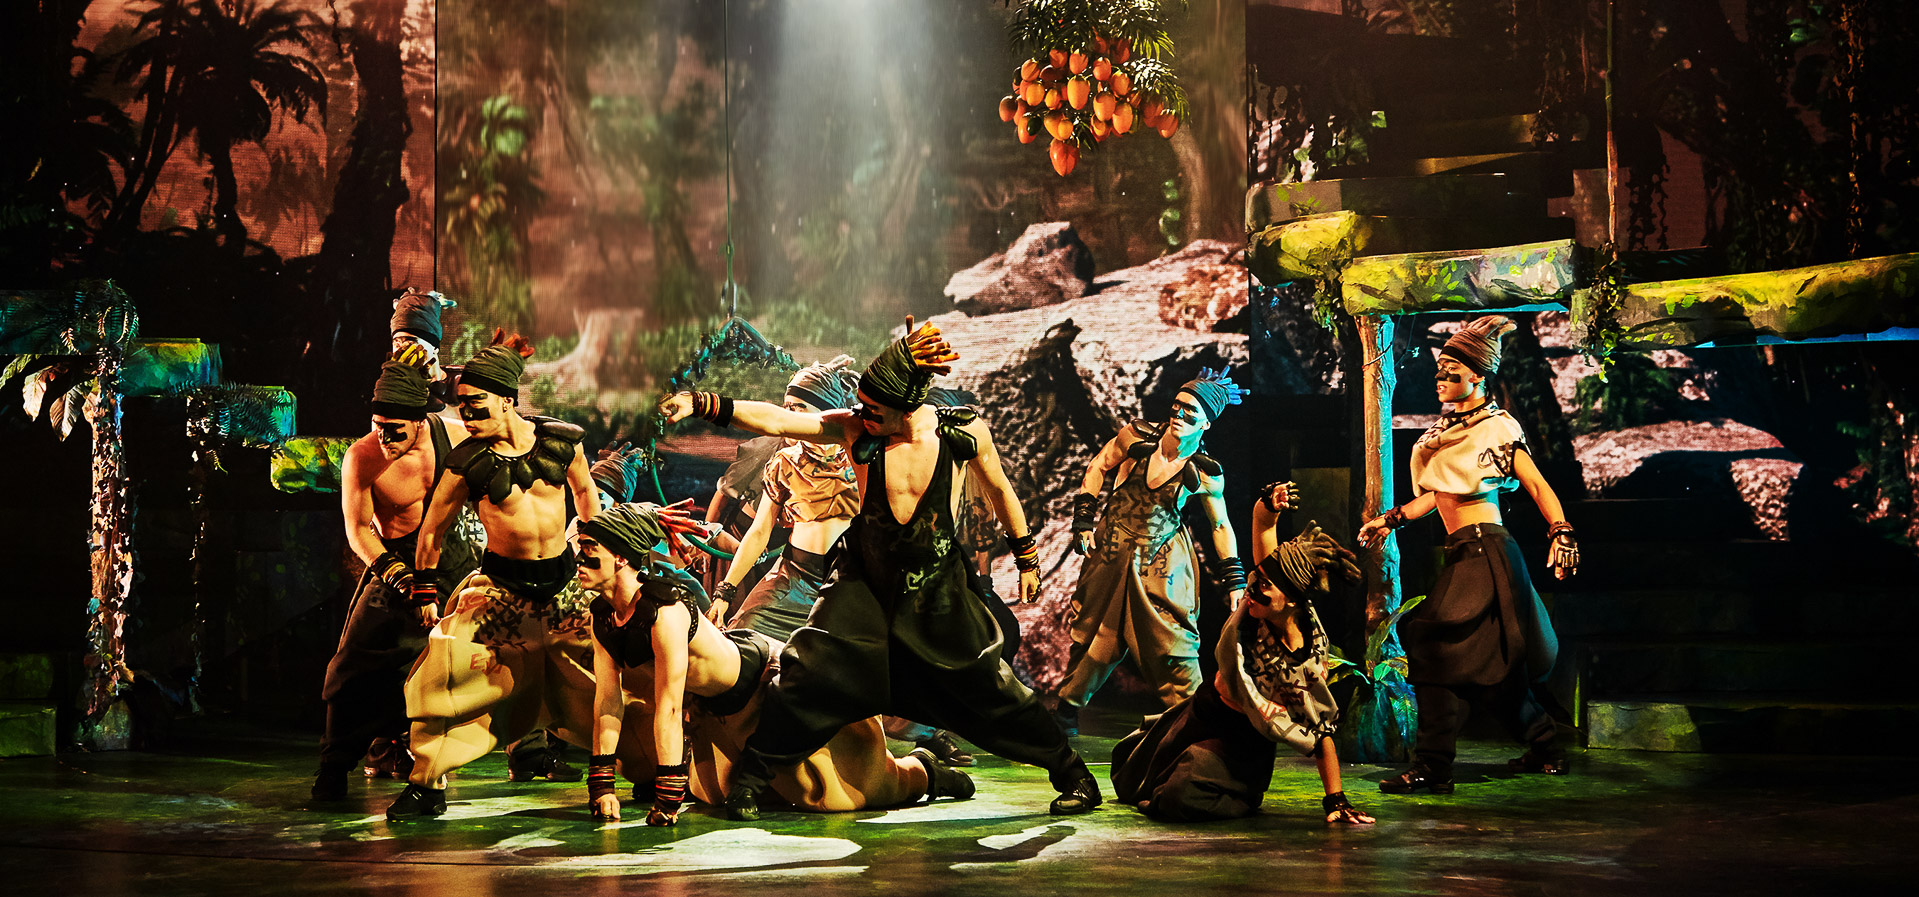 Musikhuset Aarhus: Tarzan svingede sig ind over publikum med fortryllende junglemagi